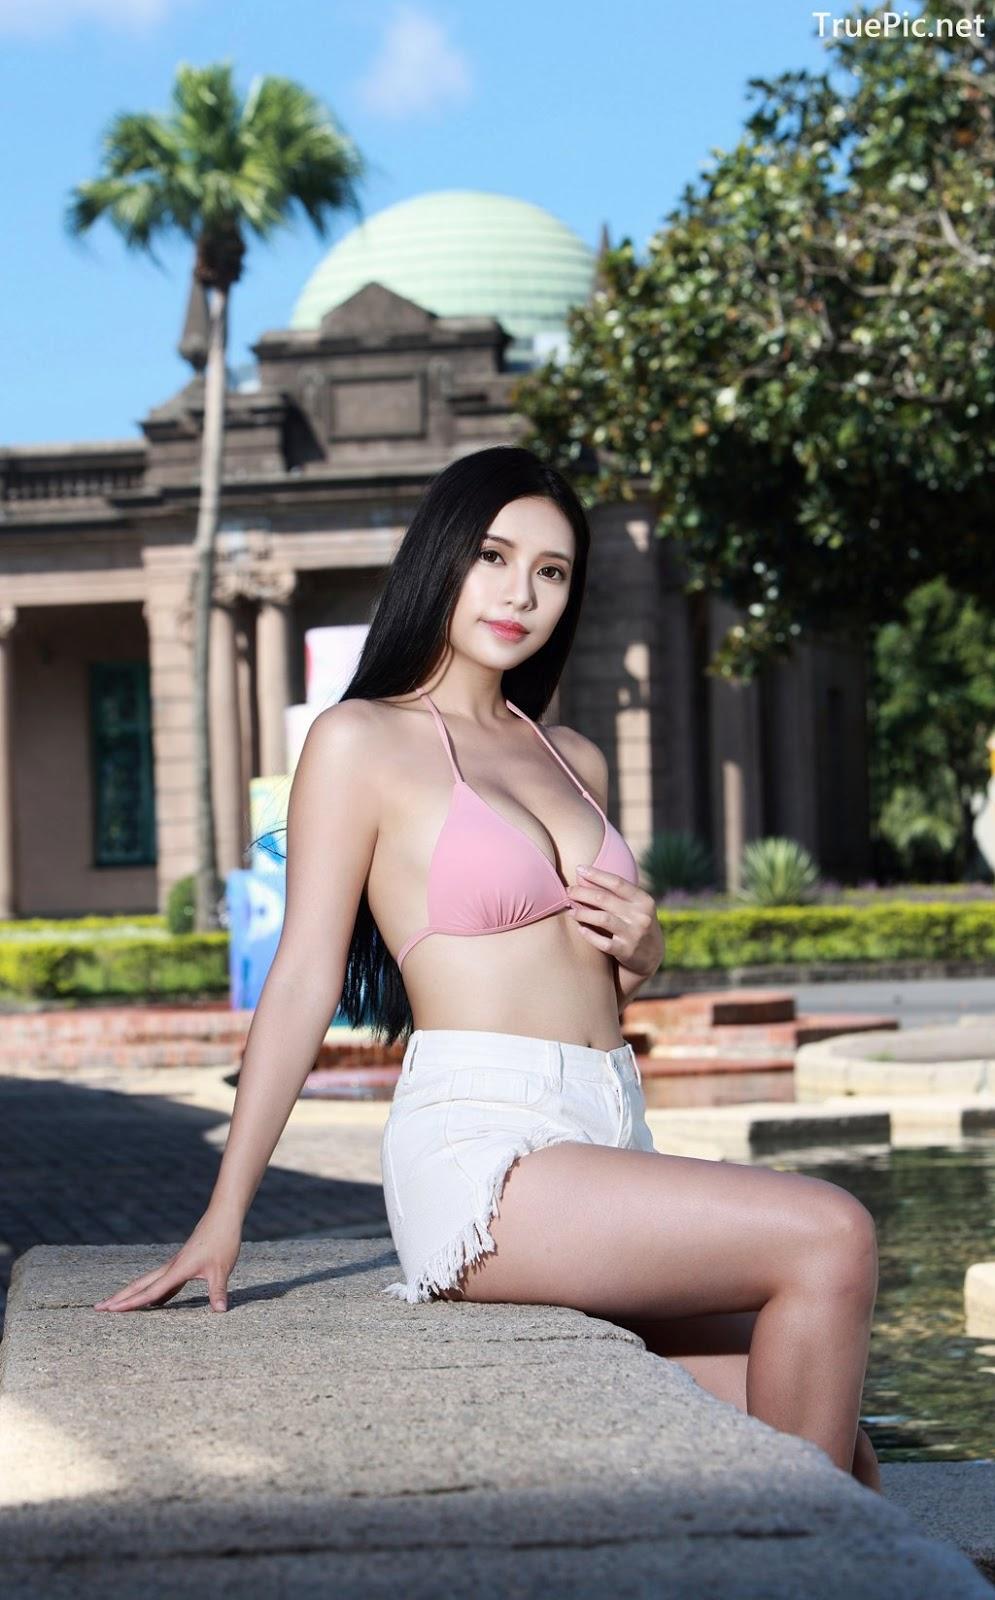 Image-Taiwanese-Model–莊舒潔-ViVi–Hot-Pink-Bikini-Top-and-White-Short-Pants-TruePic.net- Picture-10